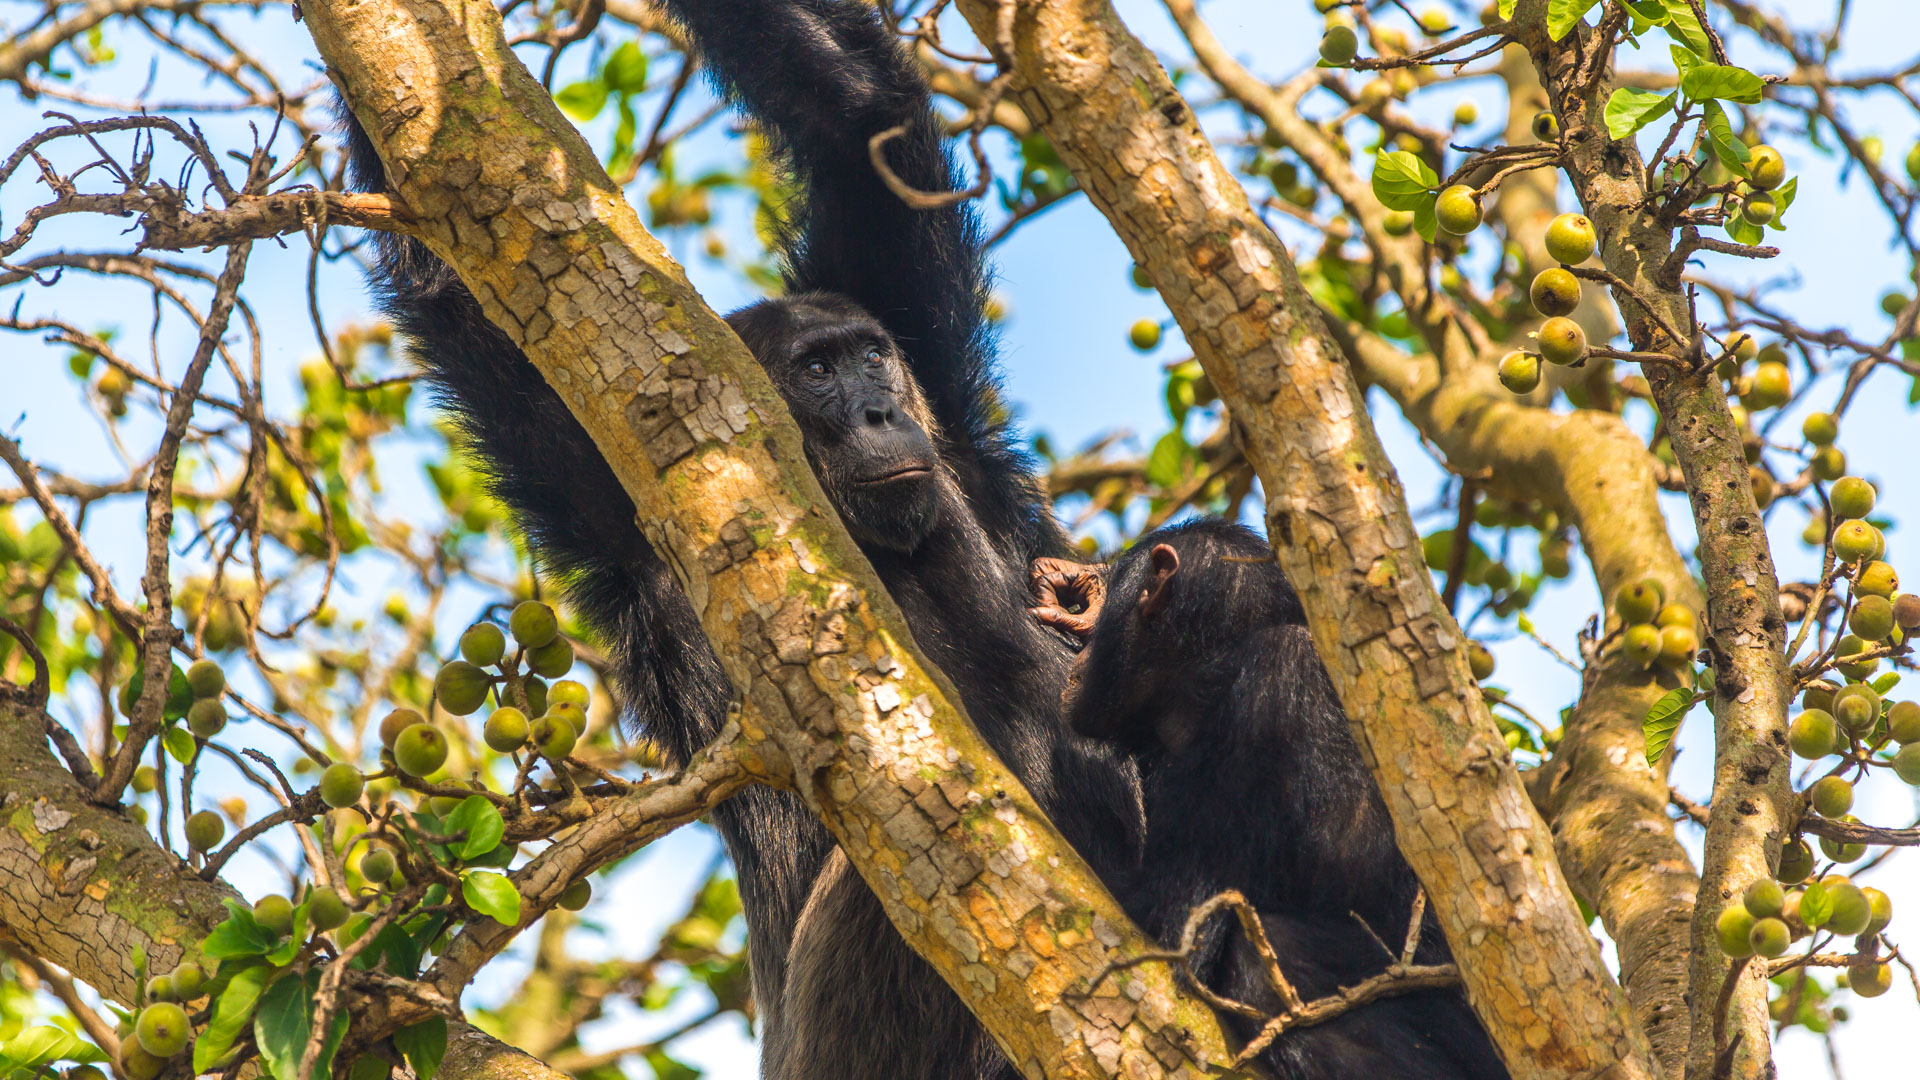 Chimpanzees in Queen Elizabeth National Park